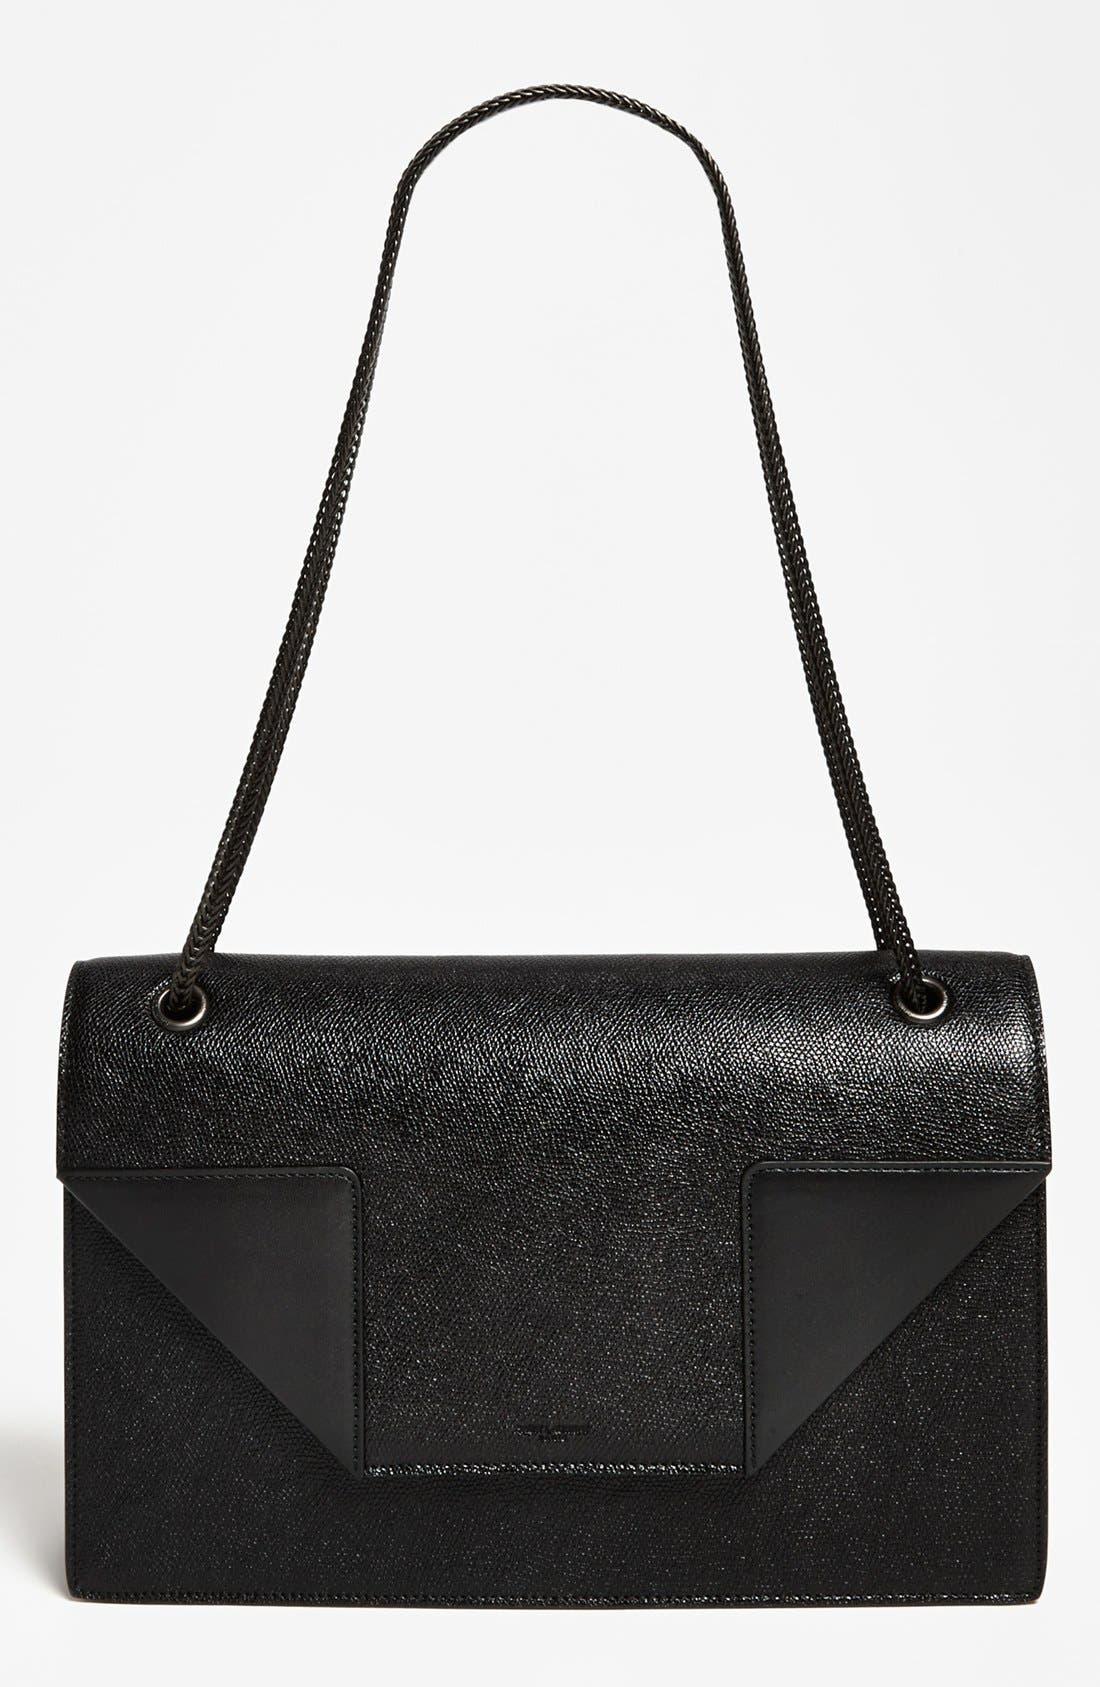 Alternate Image 1 Selected - Saint Laurent 'Betty - Medium' Leather Shoulder Bag